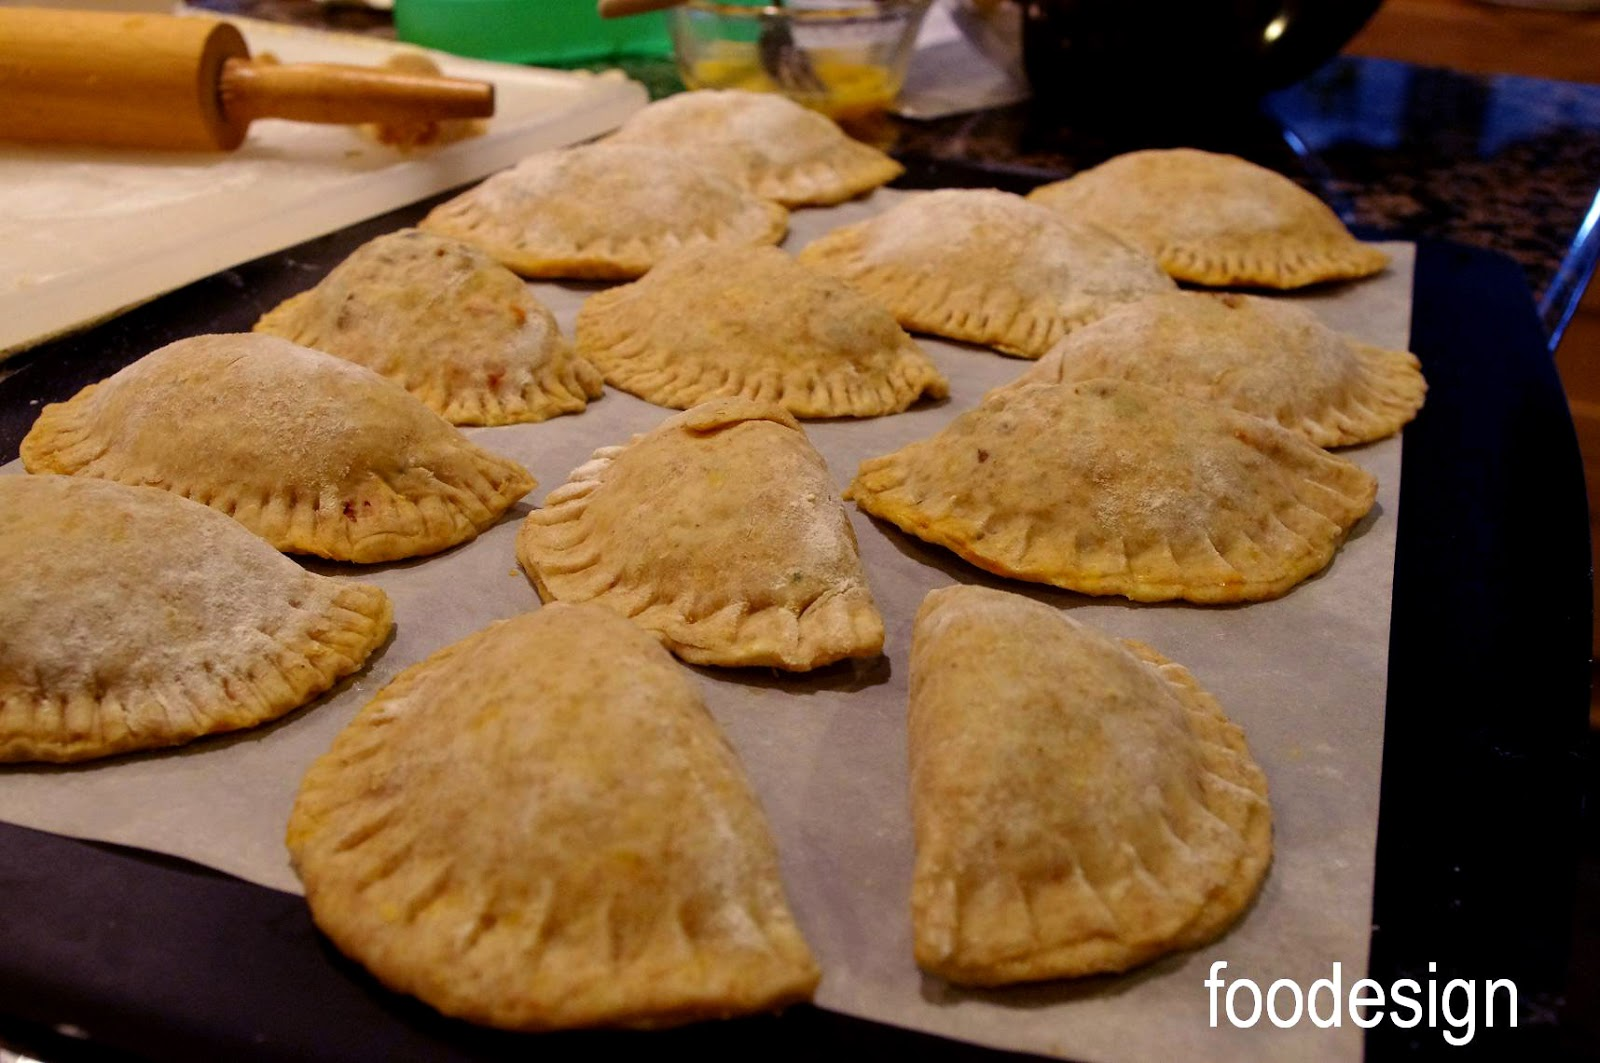 ... empanadas filled with chicken picadillo tuna fish empanadas empanadas